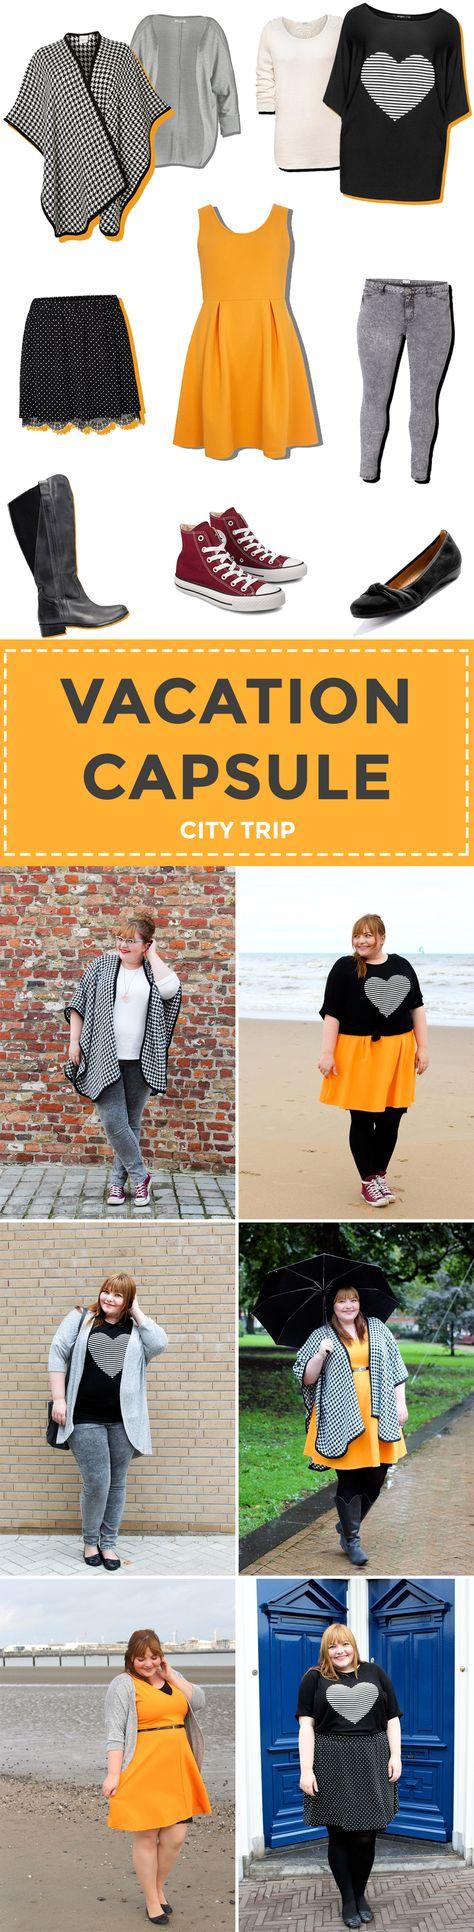 Plus Size Vacation Capsule City Trip Autumn/Fall // Packliste Städtetrip im Herbst